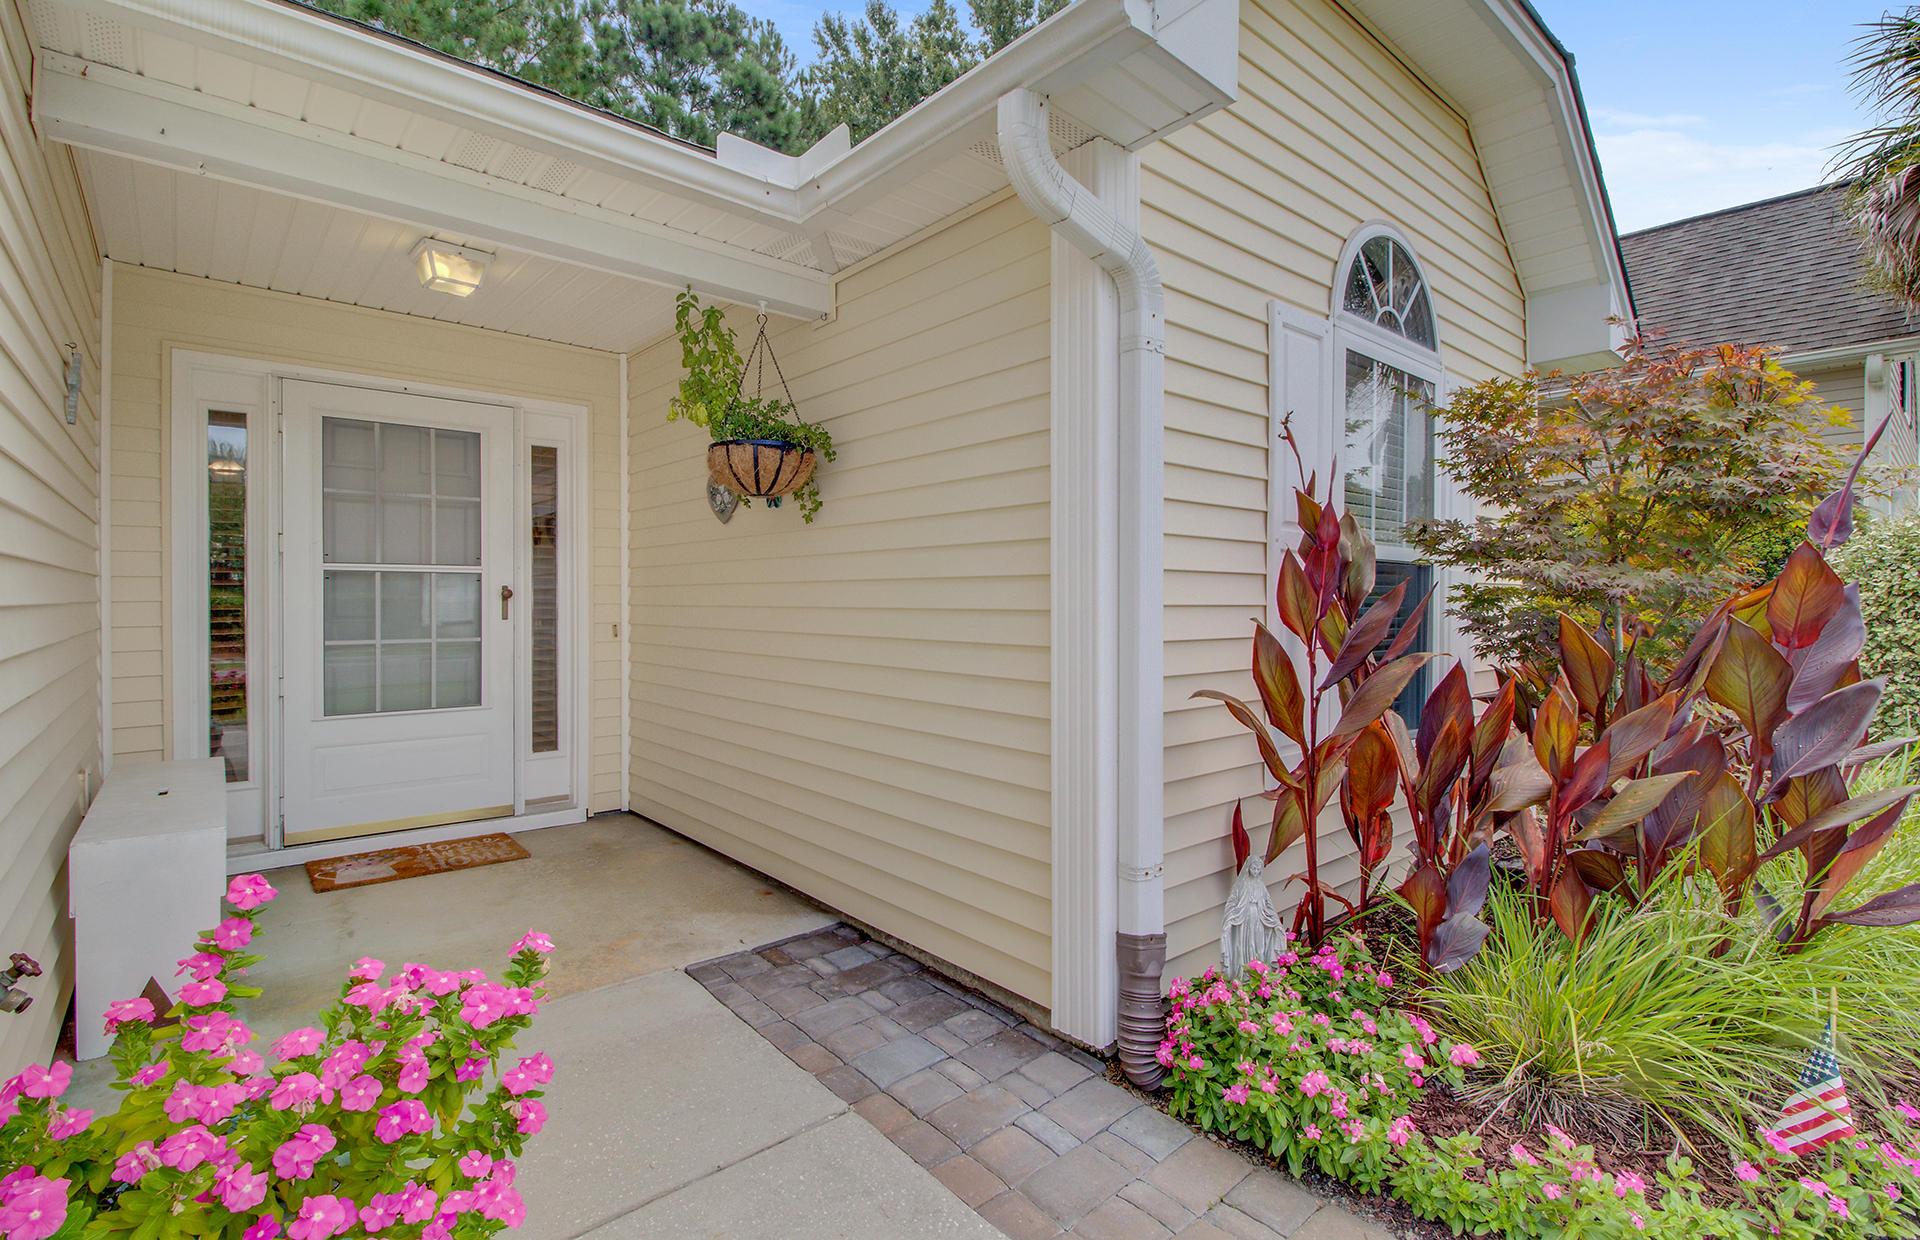 Park West Homes For Sale - 1500 Wellesley, Mount Pleasant, SC - 20